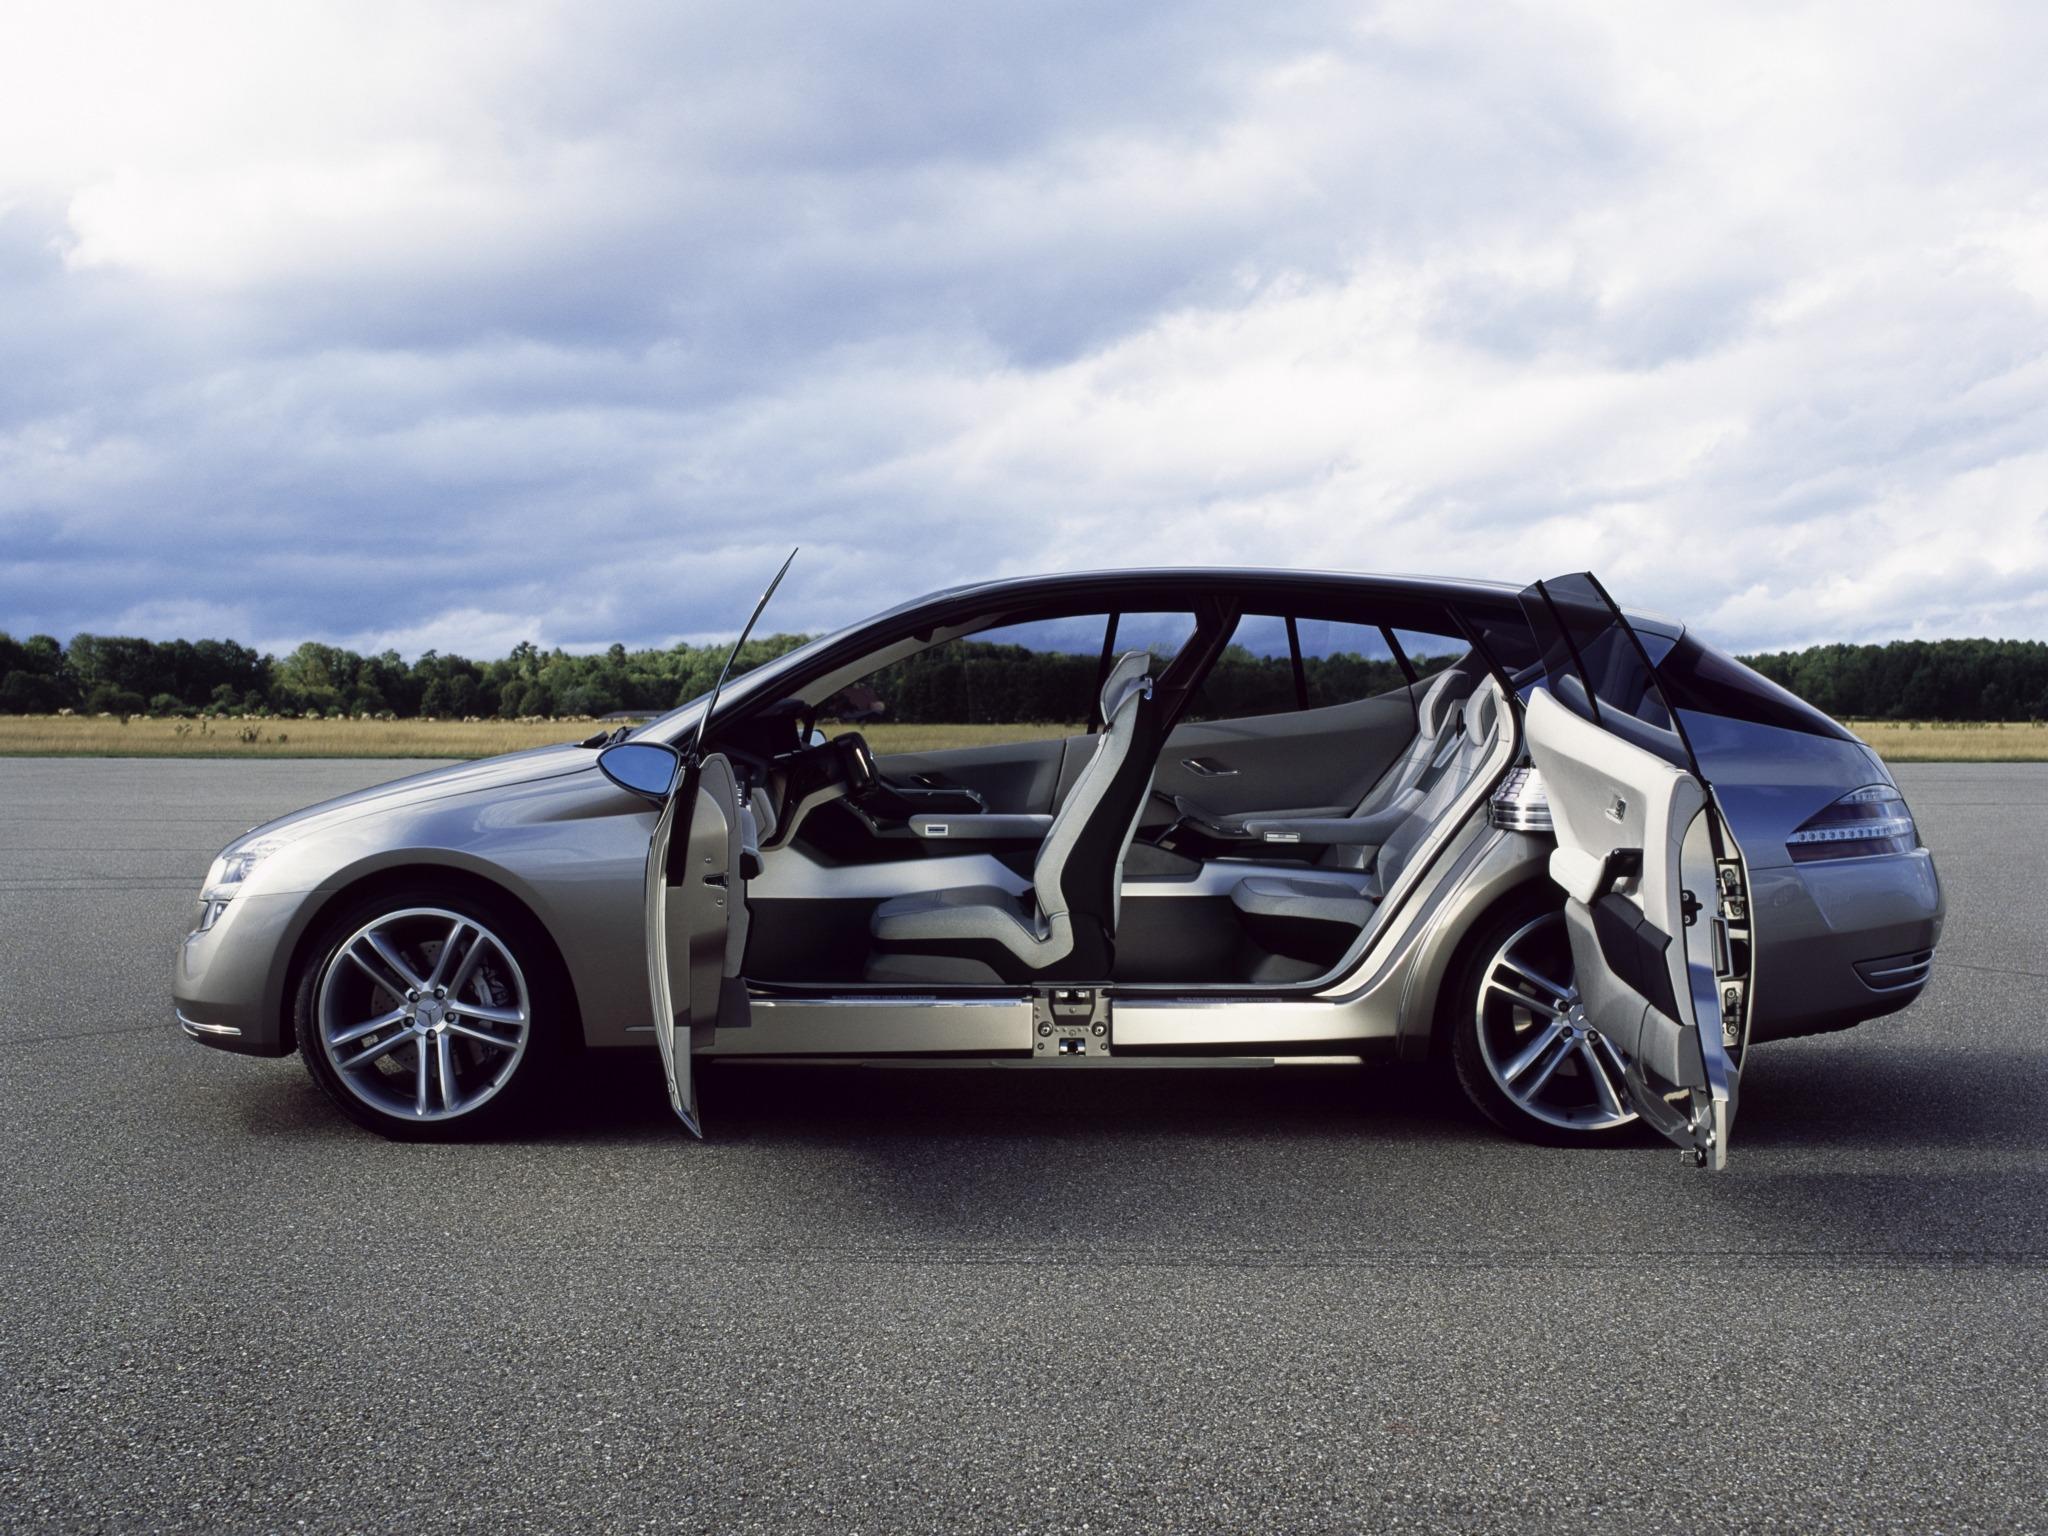 Mercedes benz f500 mind concept 2003 old concept cars for Mercedes benz concept